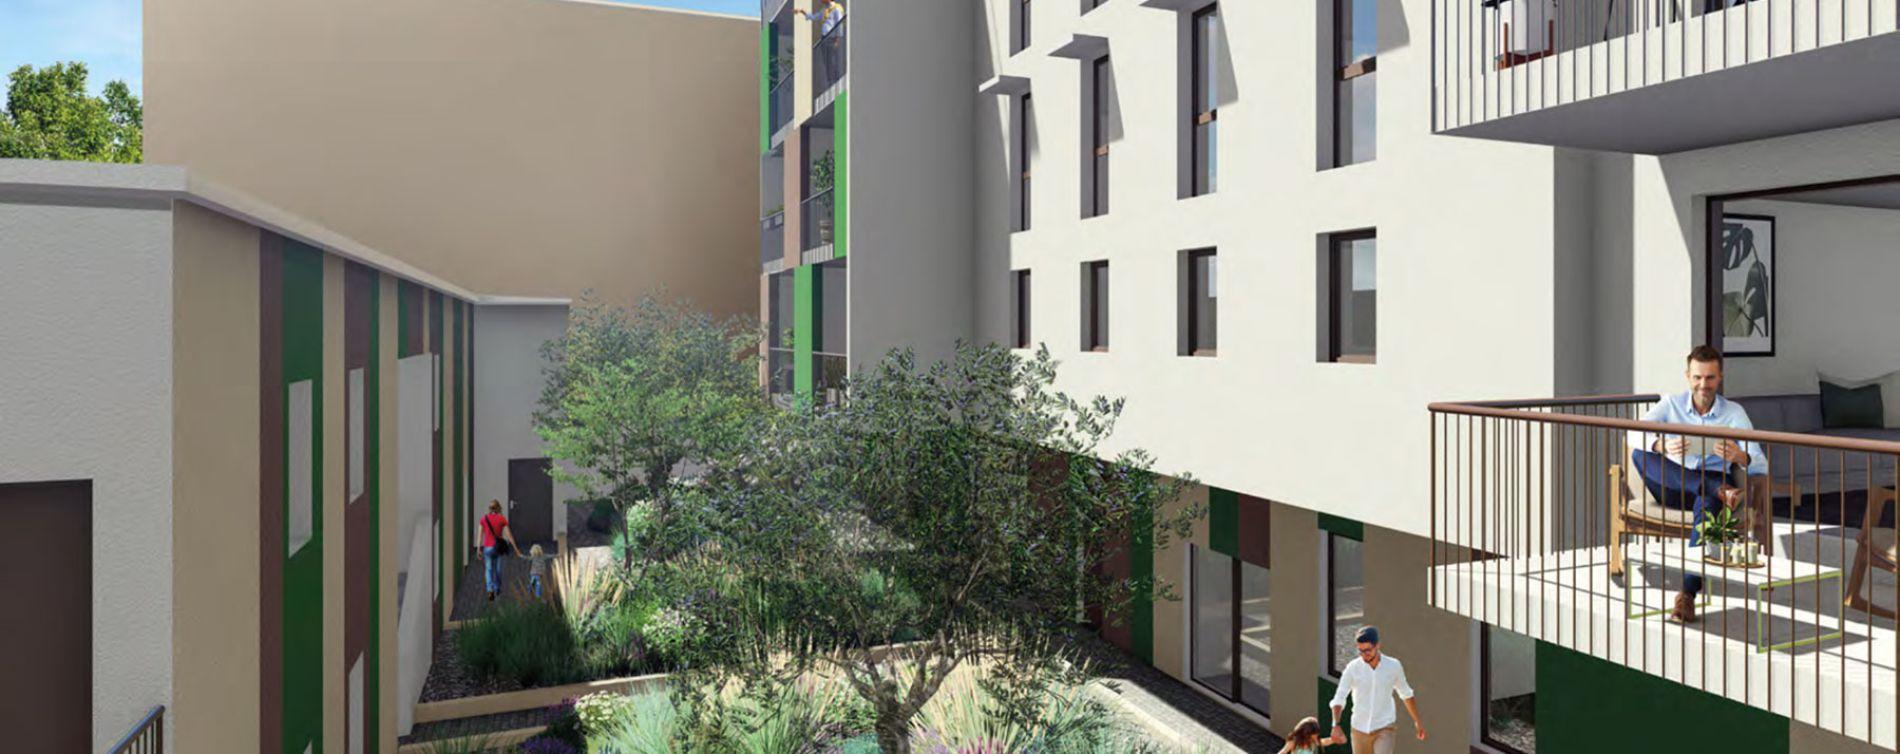 Juvignac : programme immobilier neuve « Villa Terraza » (2)